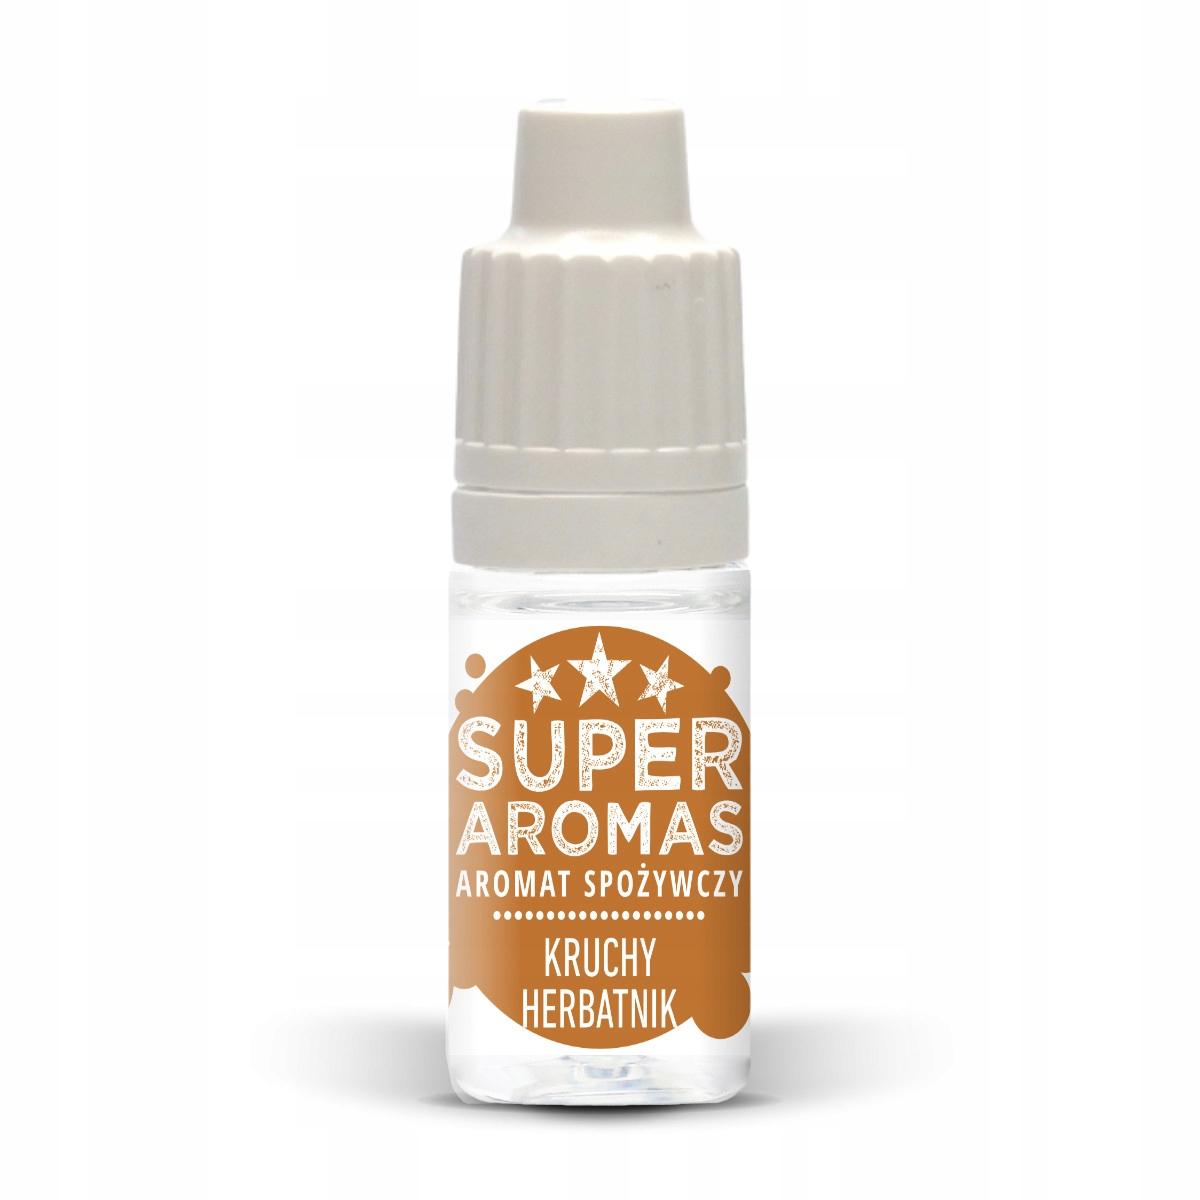 SUPER AROMAS Aromat KRUCHY HERBATNIK 10ml